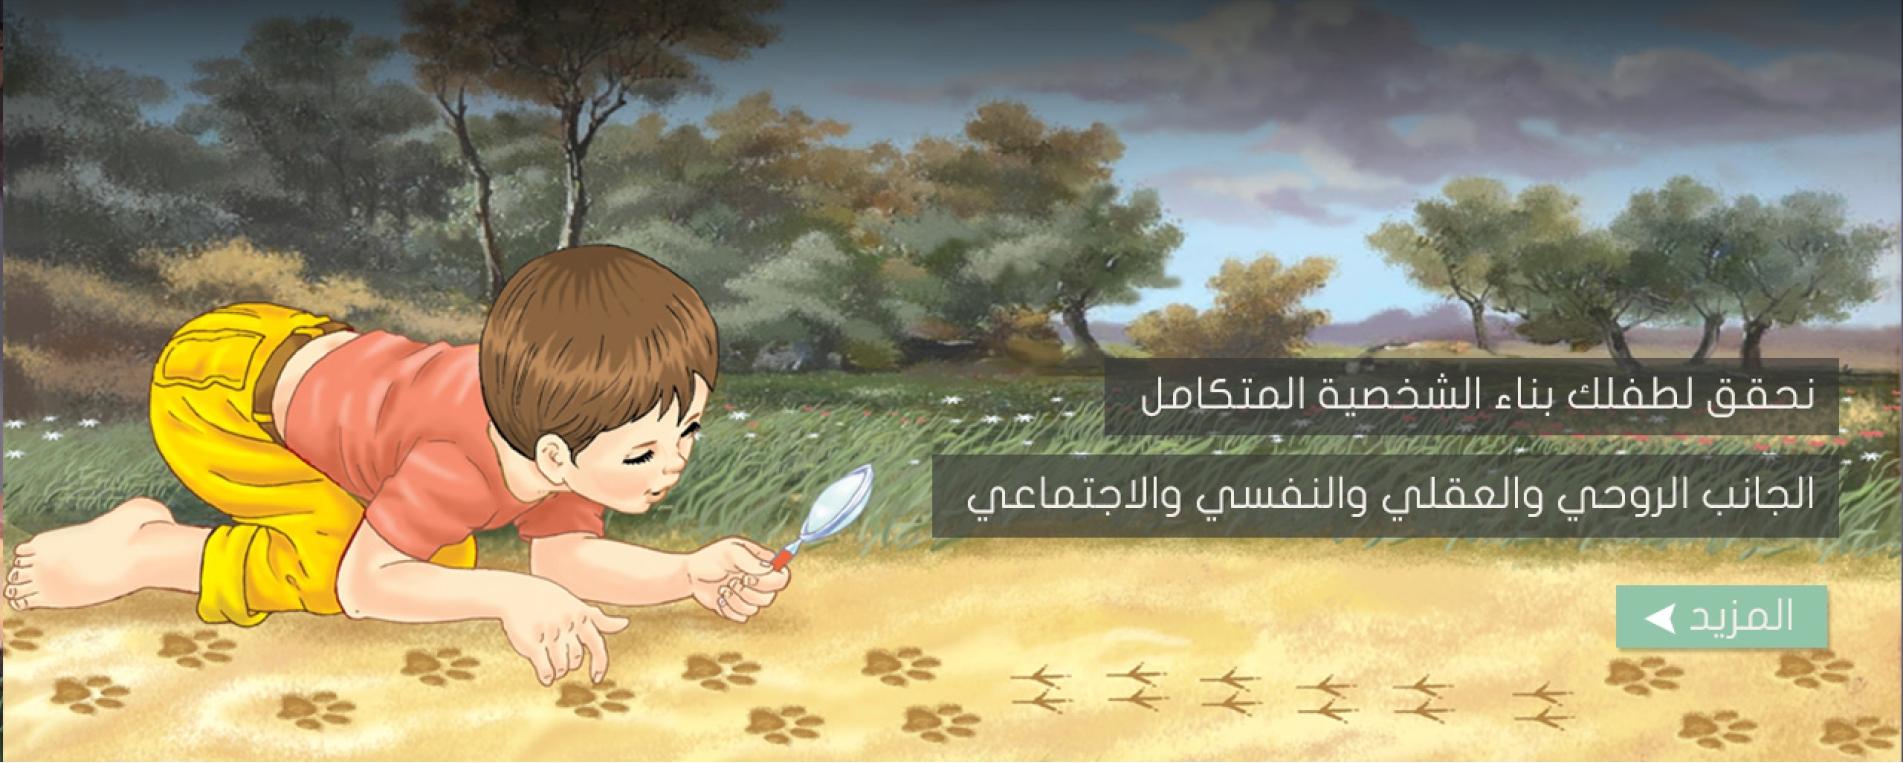 tafakkur.com